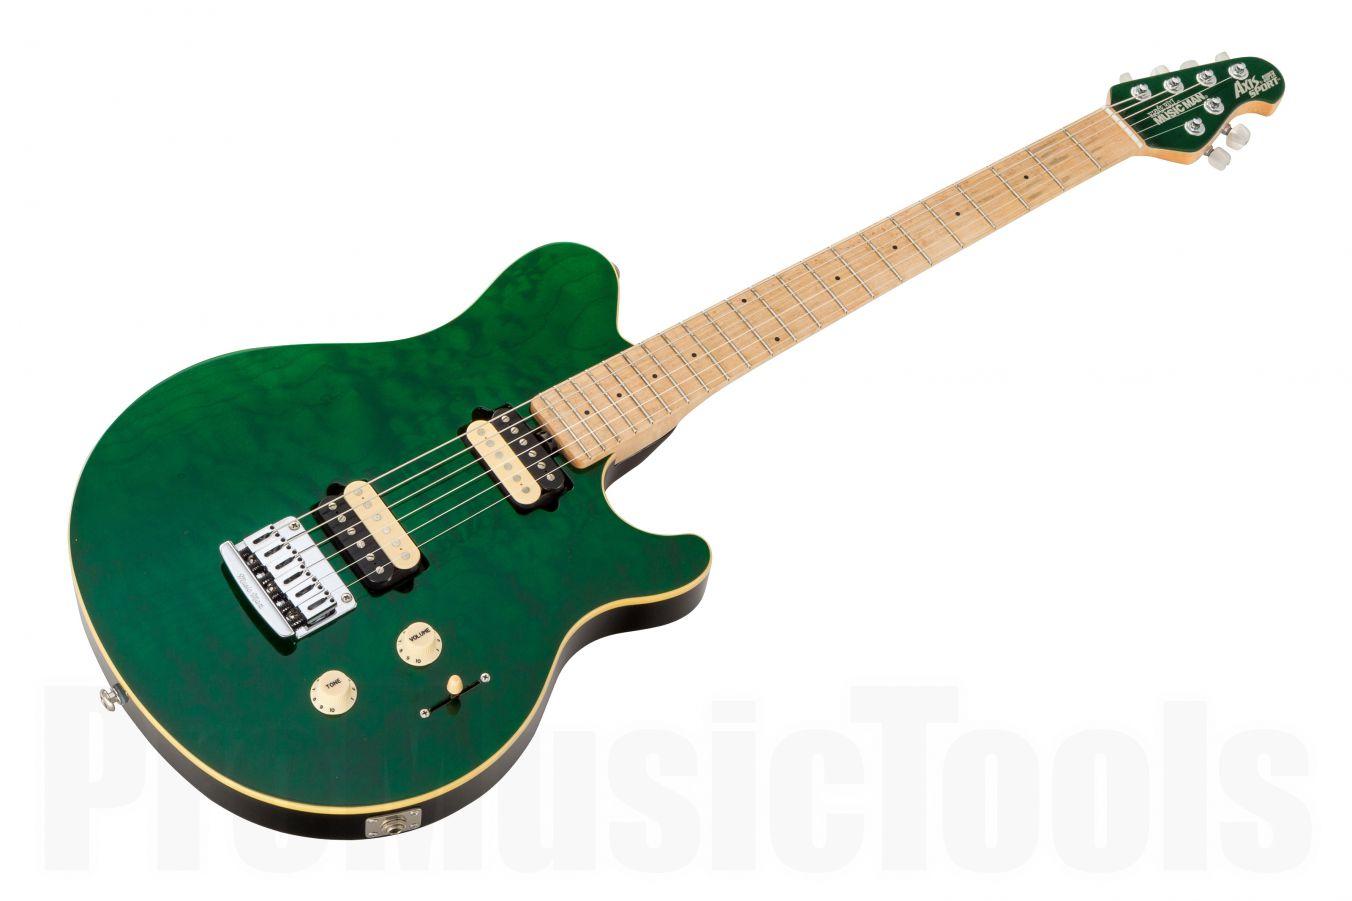 Music Man USA Axis Super Sport STD TGN - Translucent Green MN MH